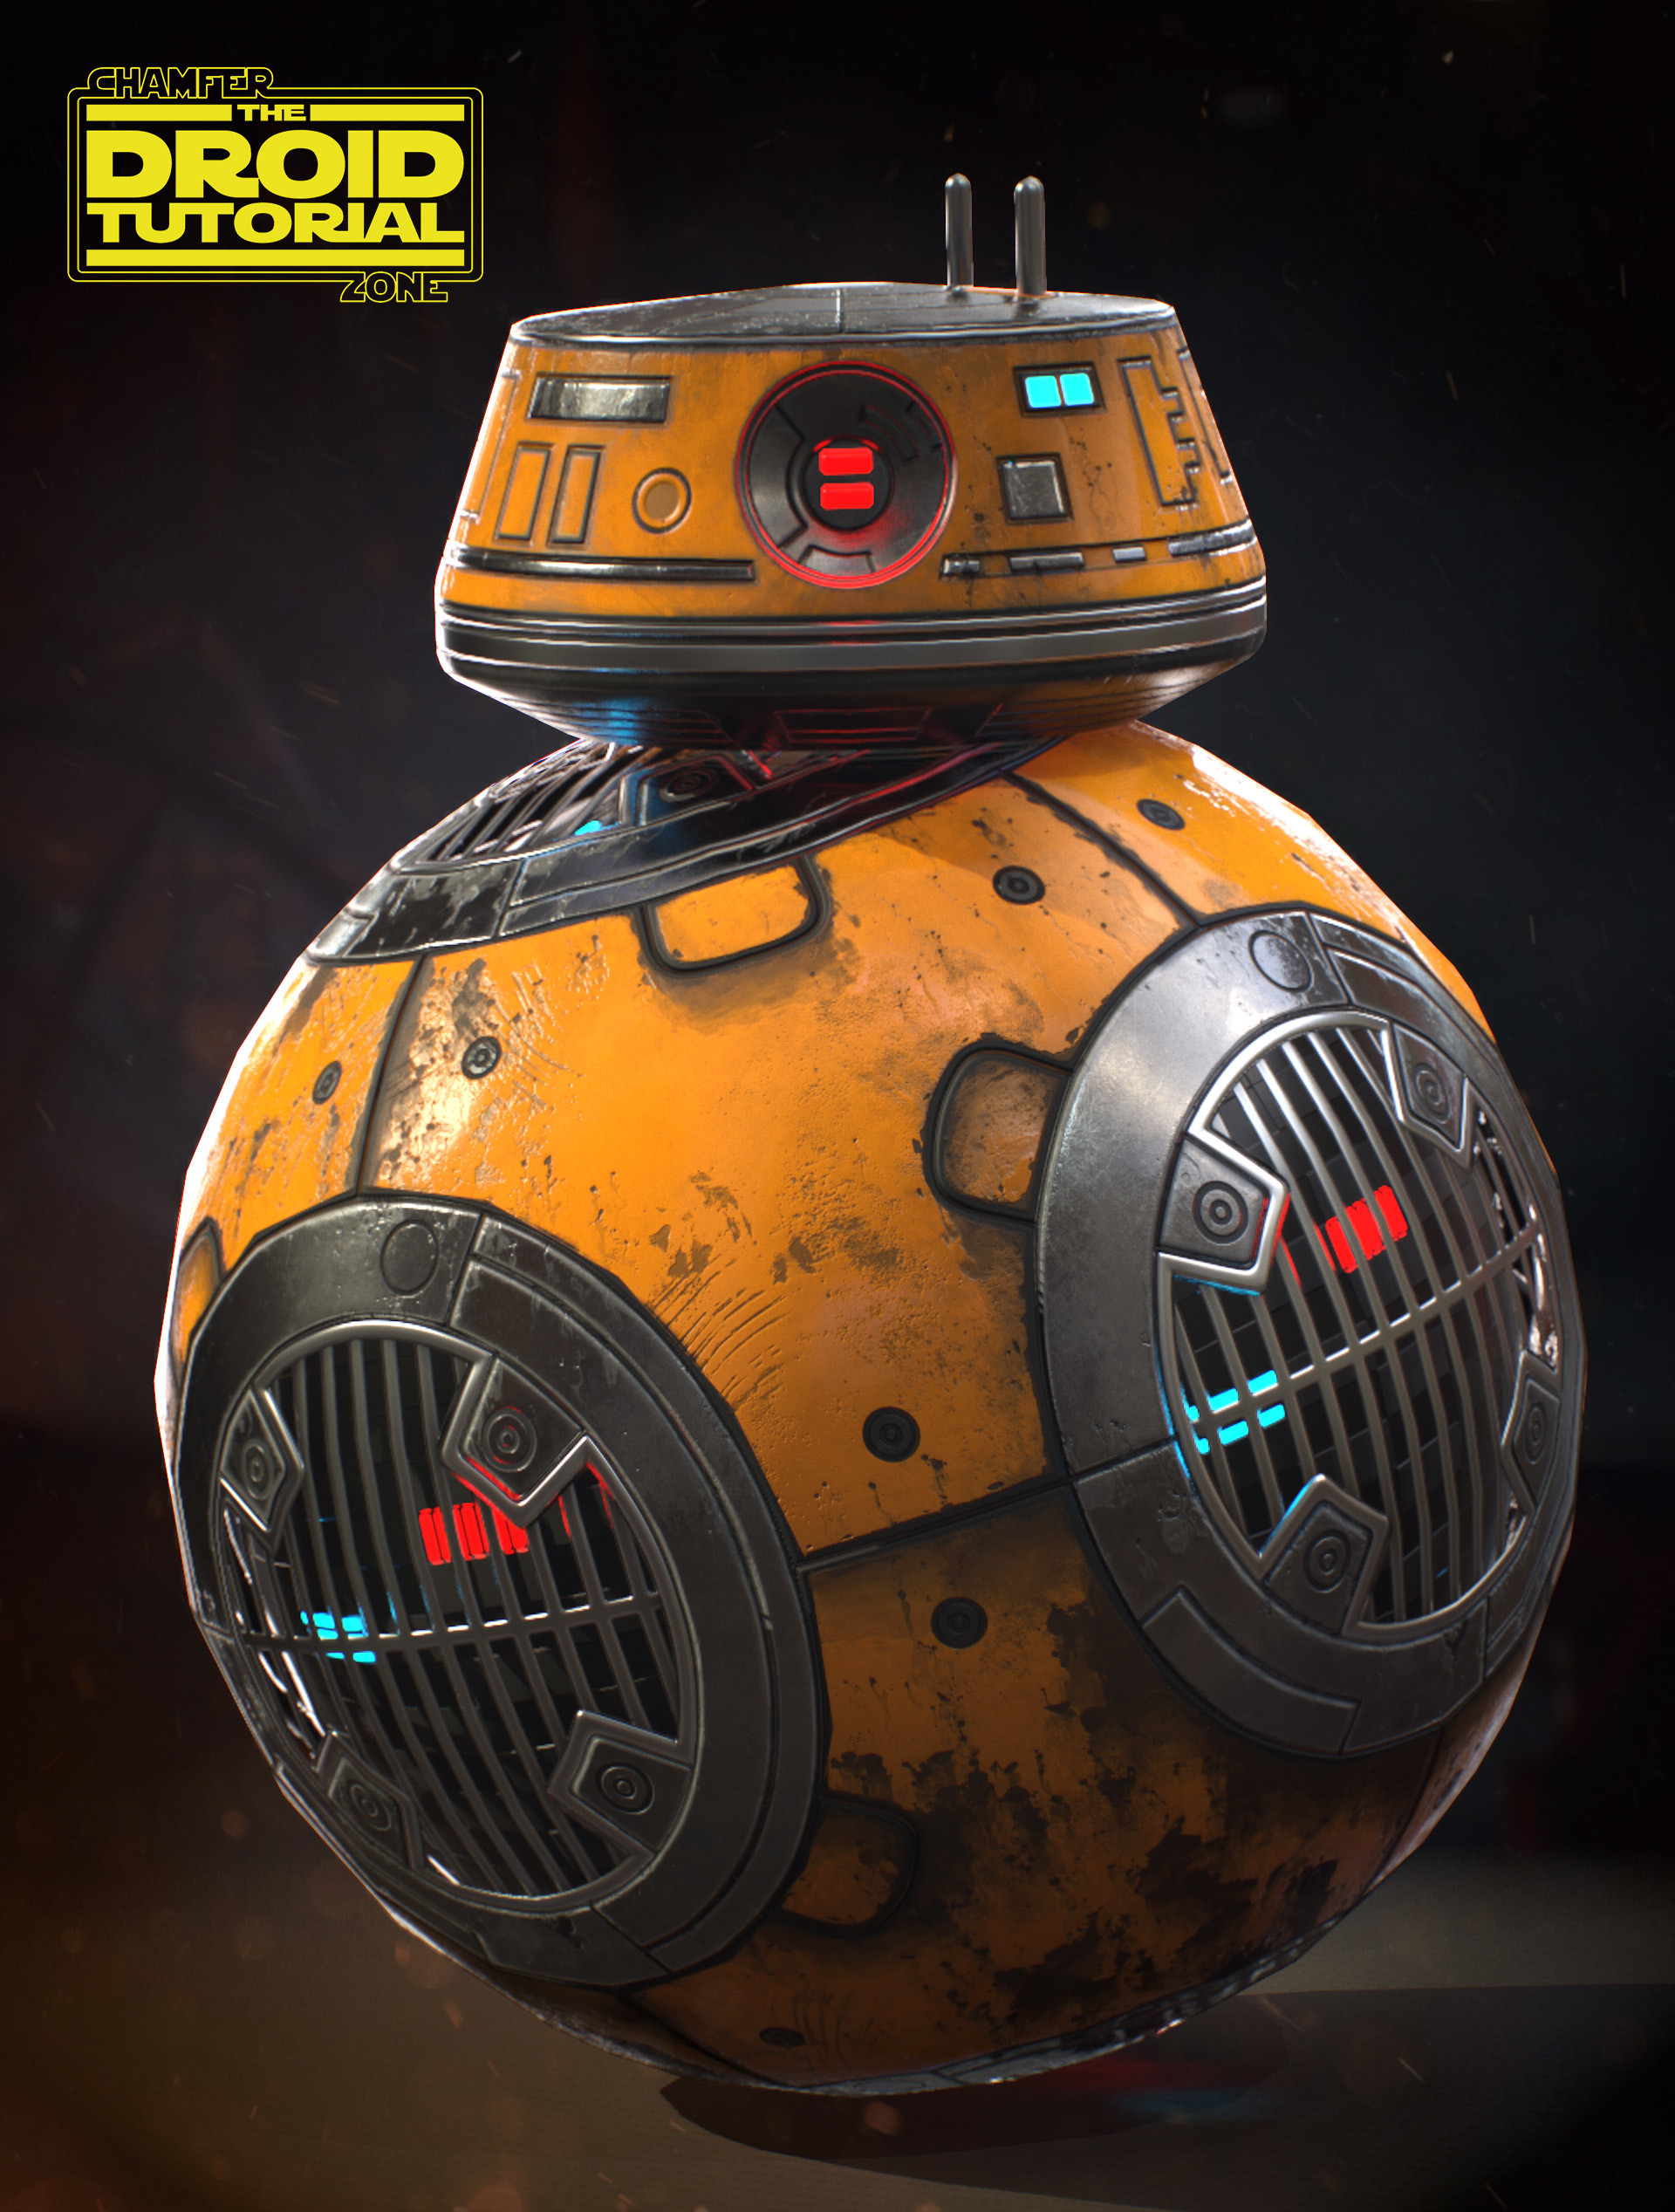 Tim bergholz chamferzone com droid yellow